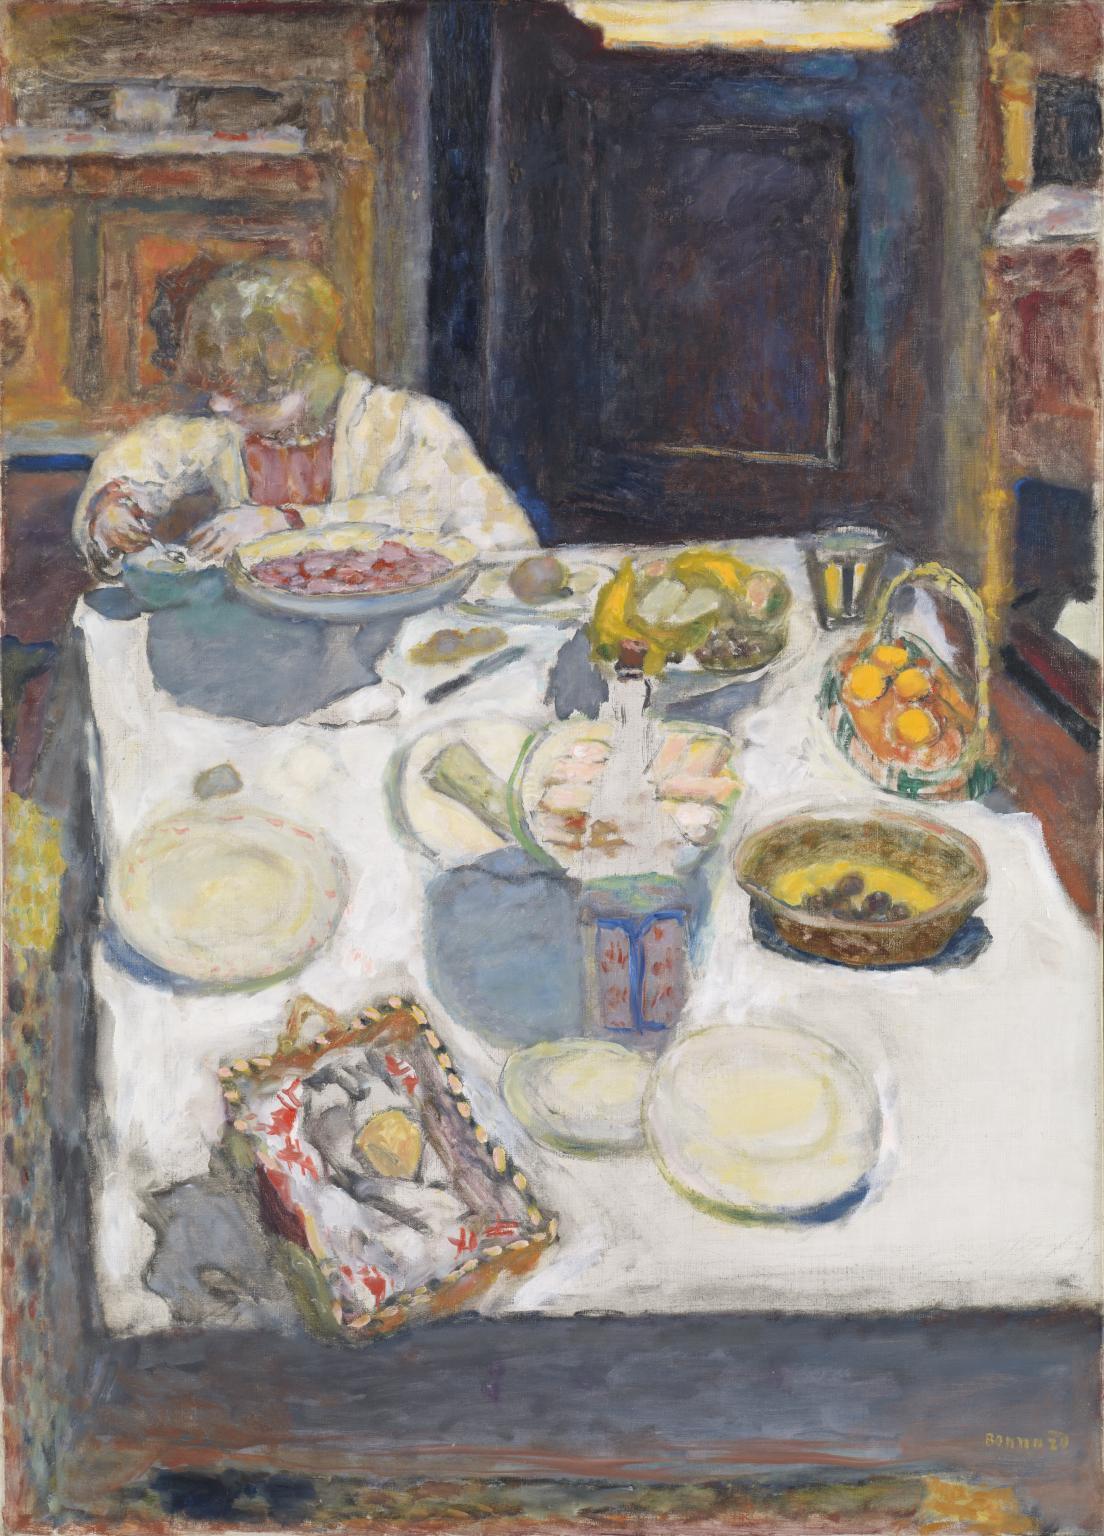 Pierre Bonnard,  The Table,  1925